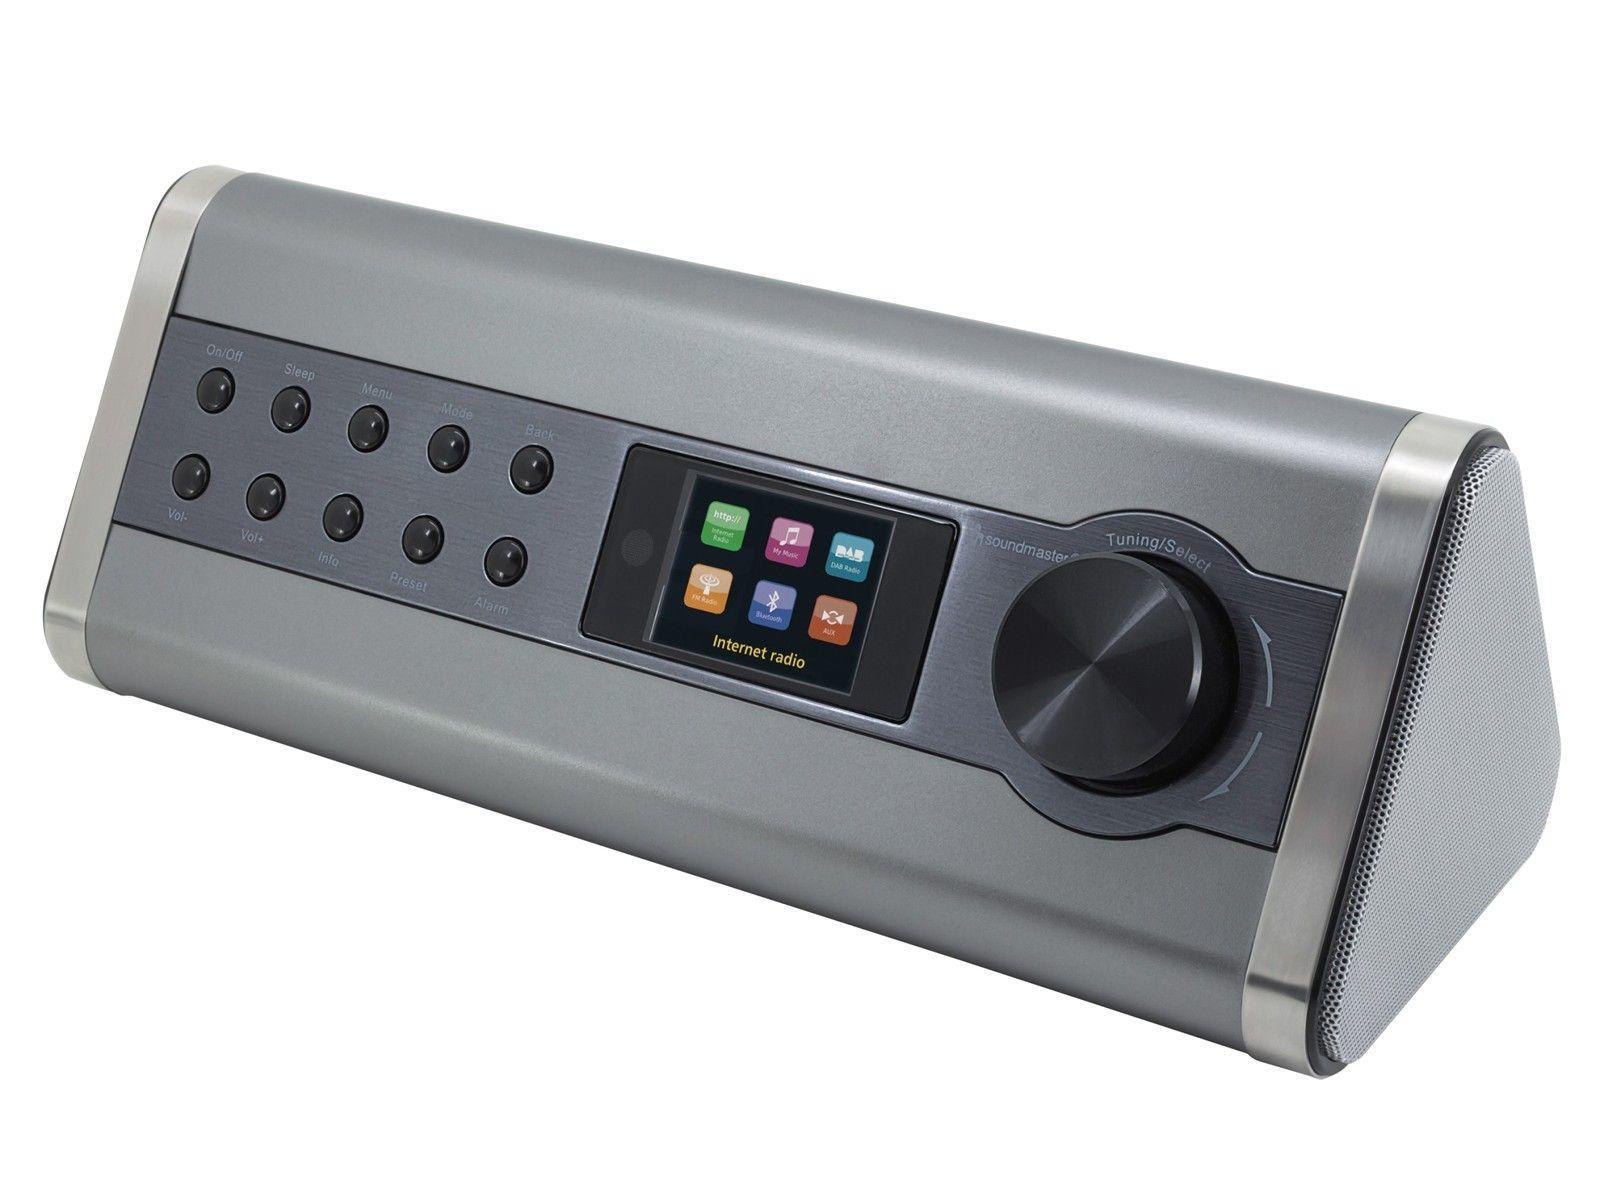 soundmaster ir3200 bluetooth speaker with fm dab. Black Bedroom Furniture Sets. Home Design Ideas